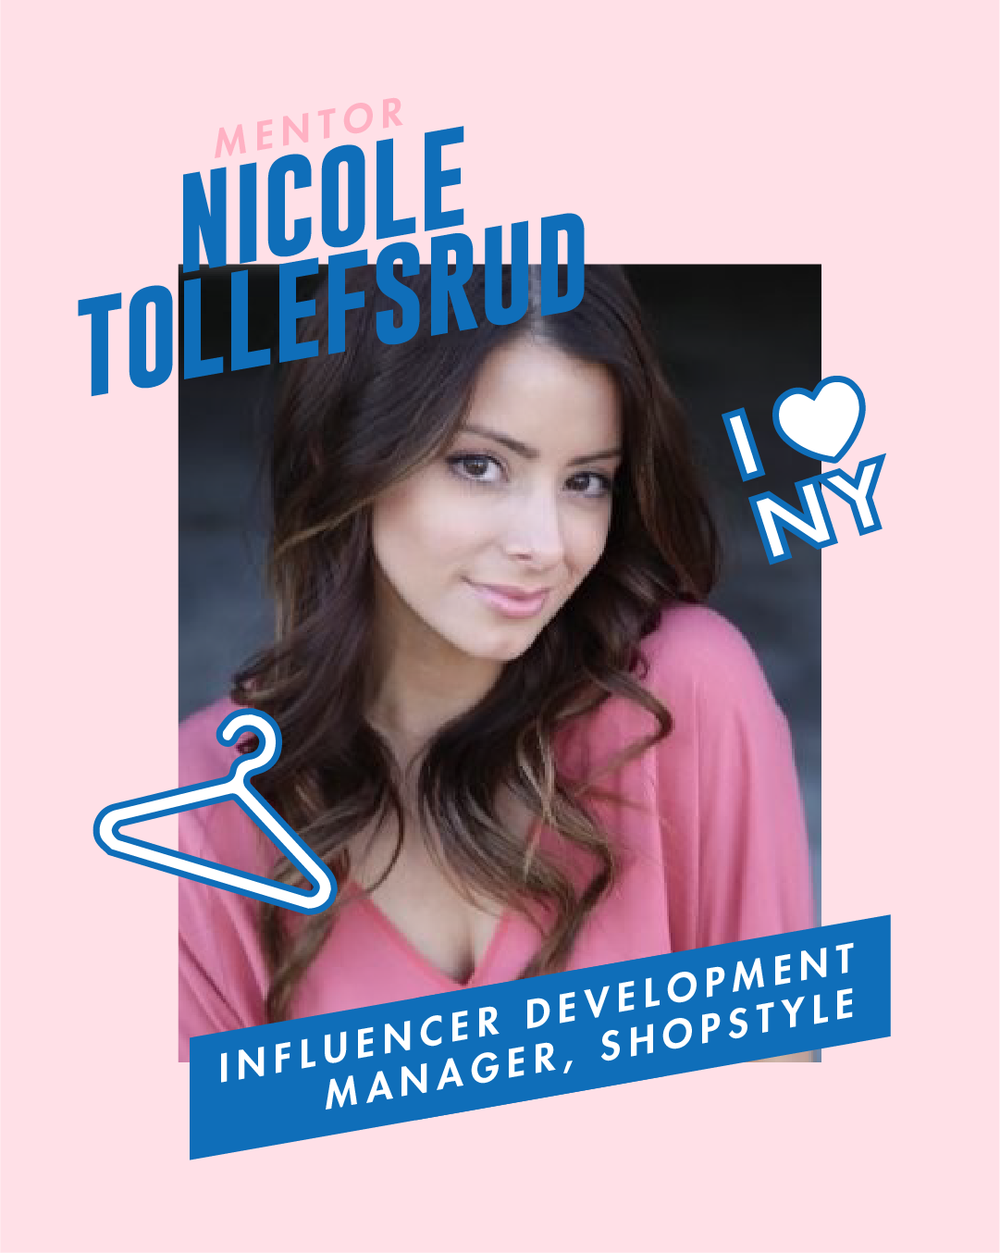 CCNYC_Speaker_NicoleTollefsrud.png